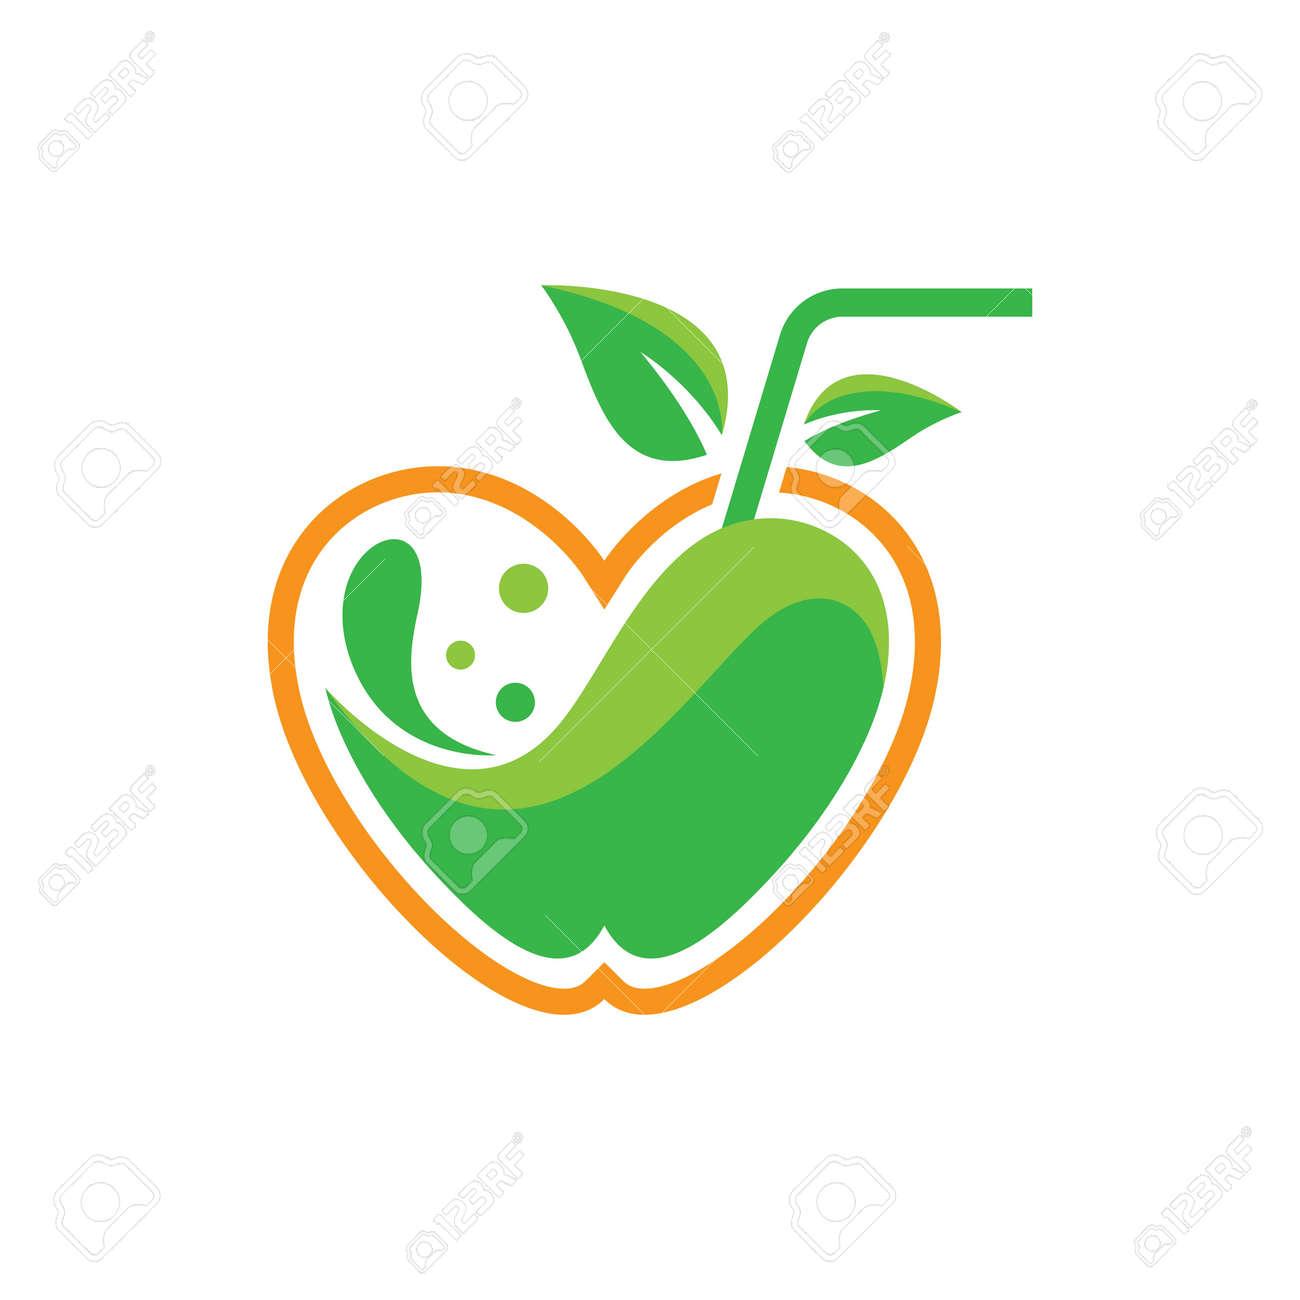 Fresh juice logo images illustration design - 173410499